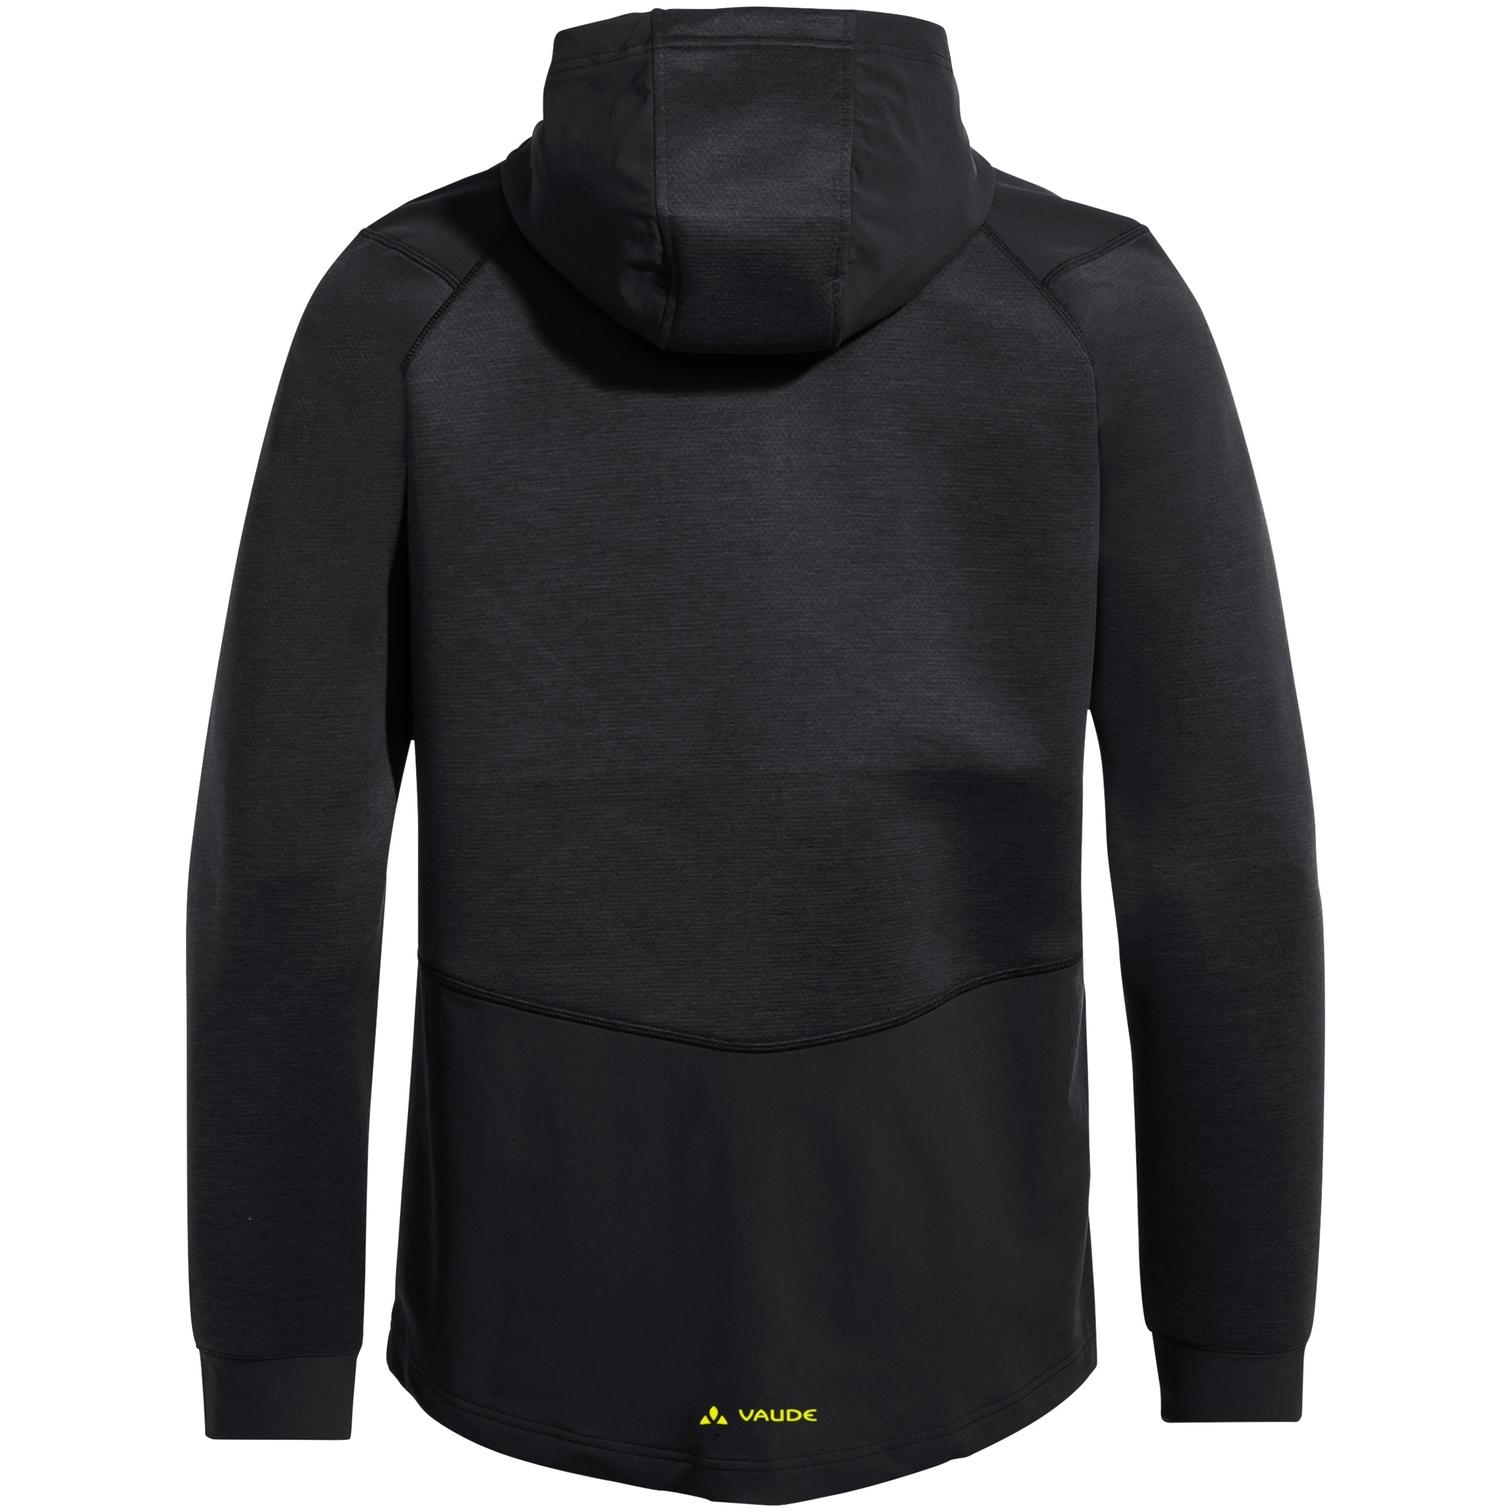 Image of Vaude Men's Minaki Hooded Jacket - black